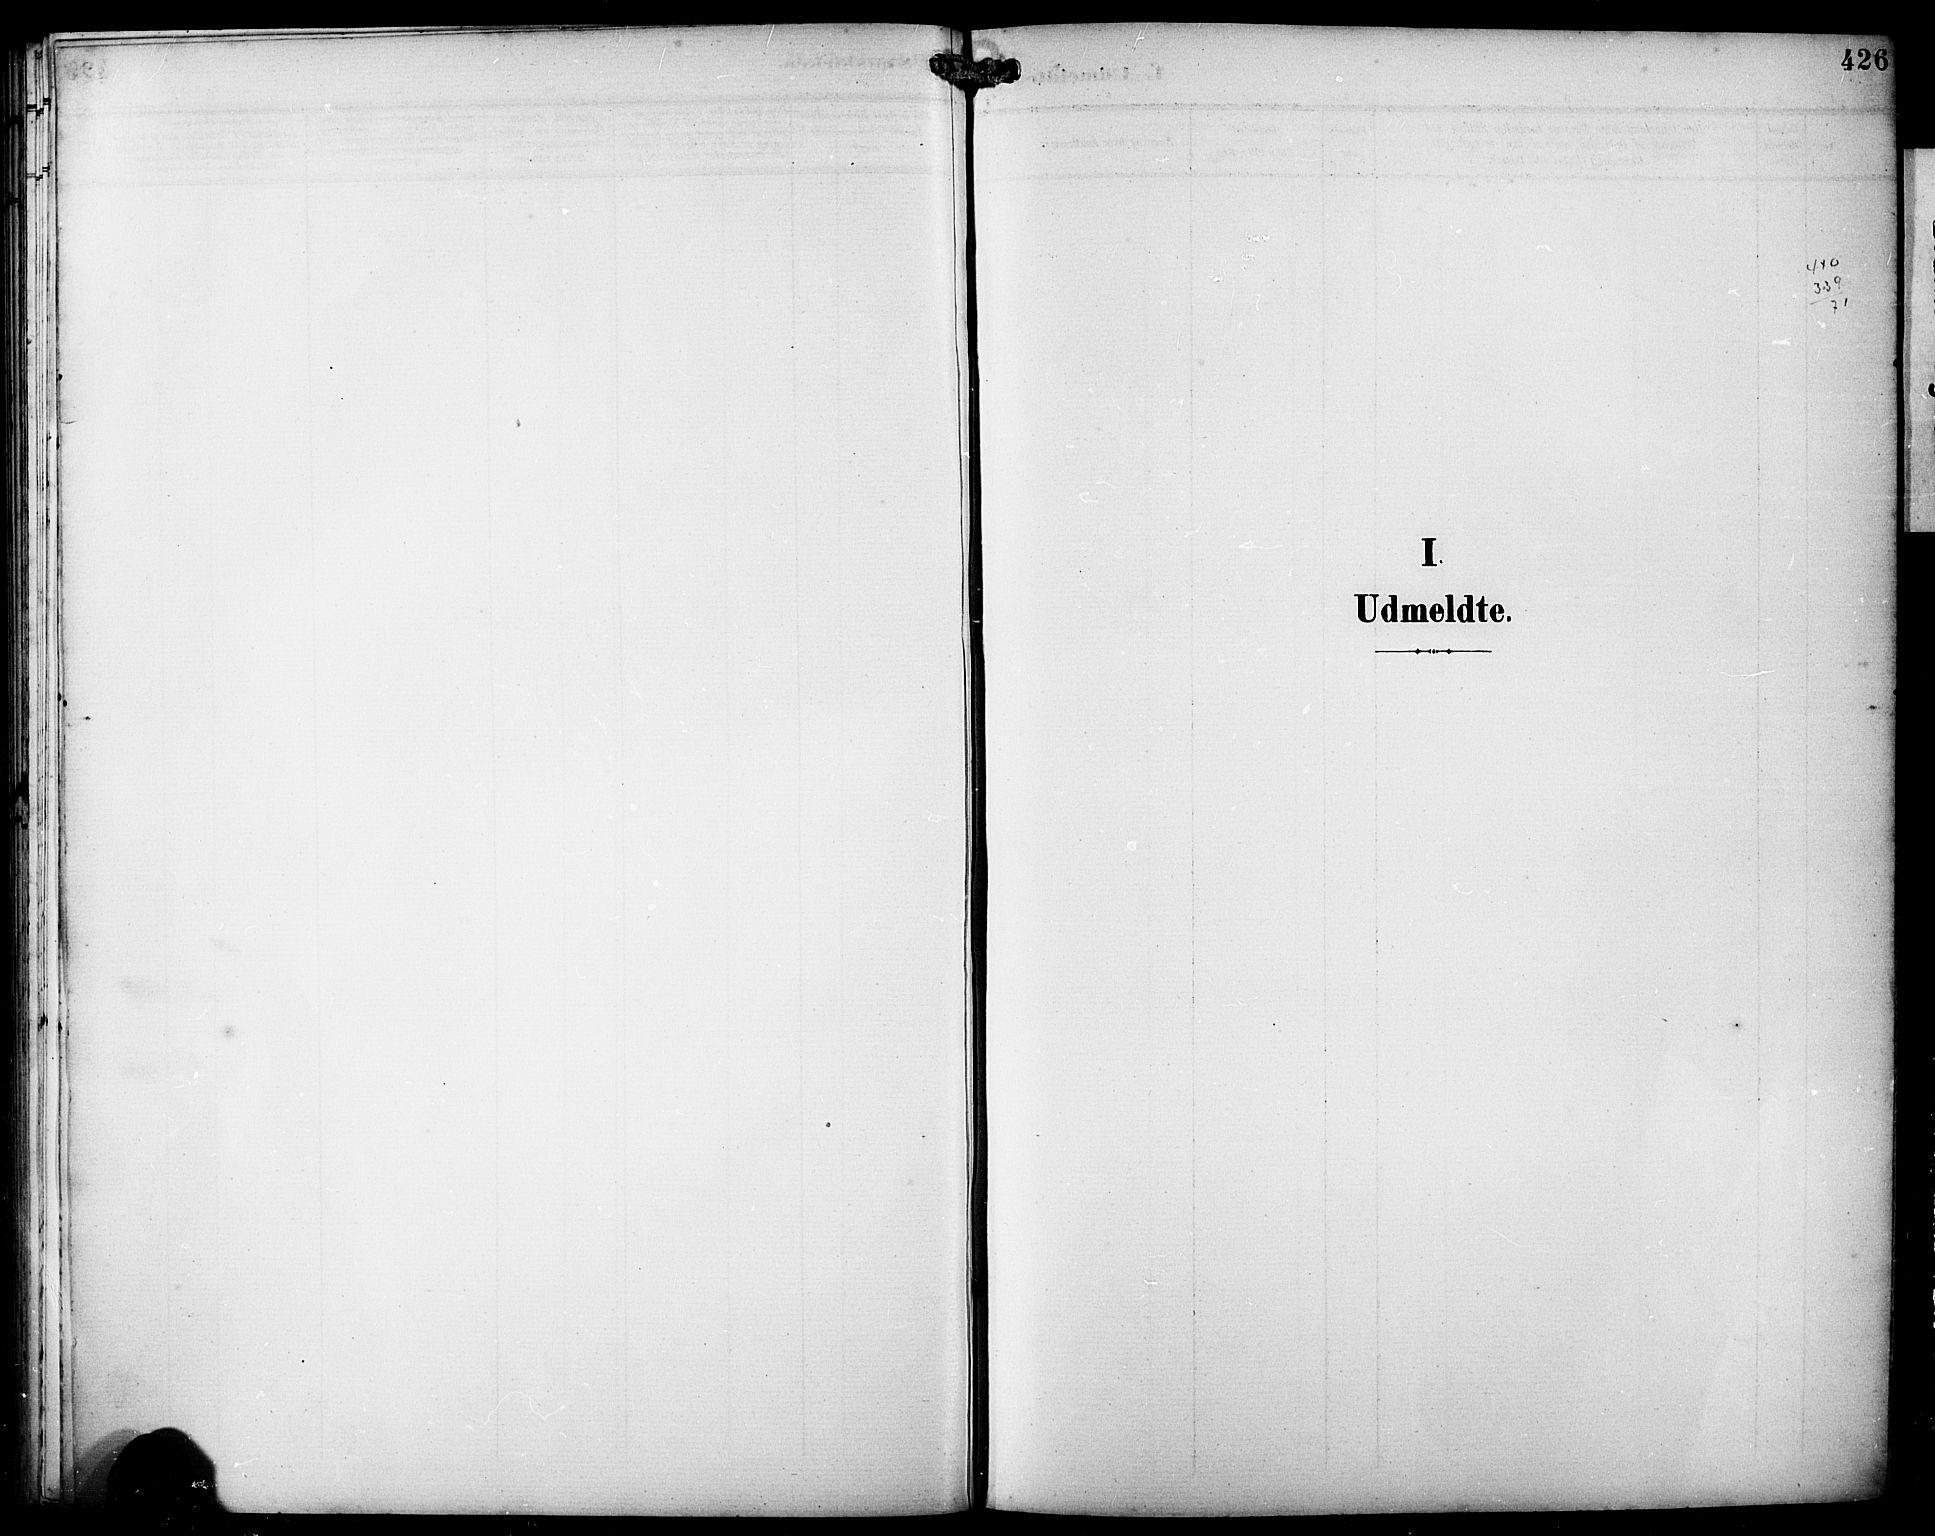 SAB, Fjell sokneprestembete, H/Hab: Klokkerbok nr. A 5, 1899-1918, s. 426